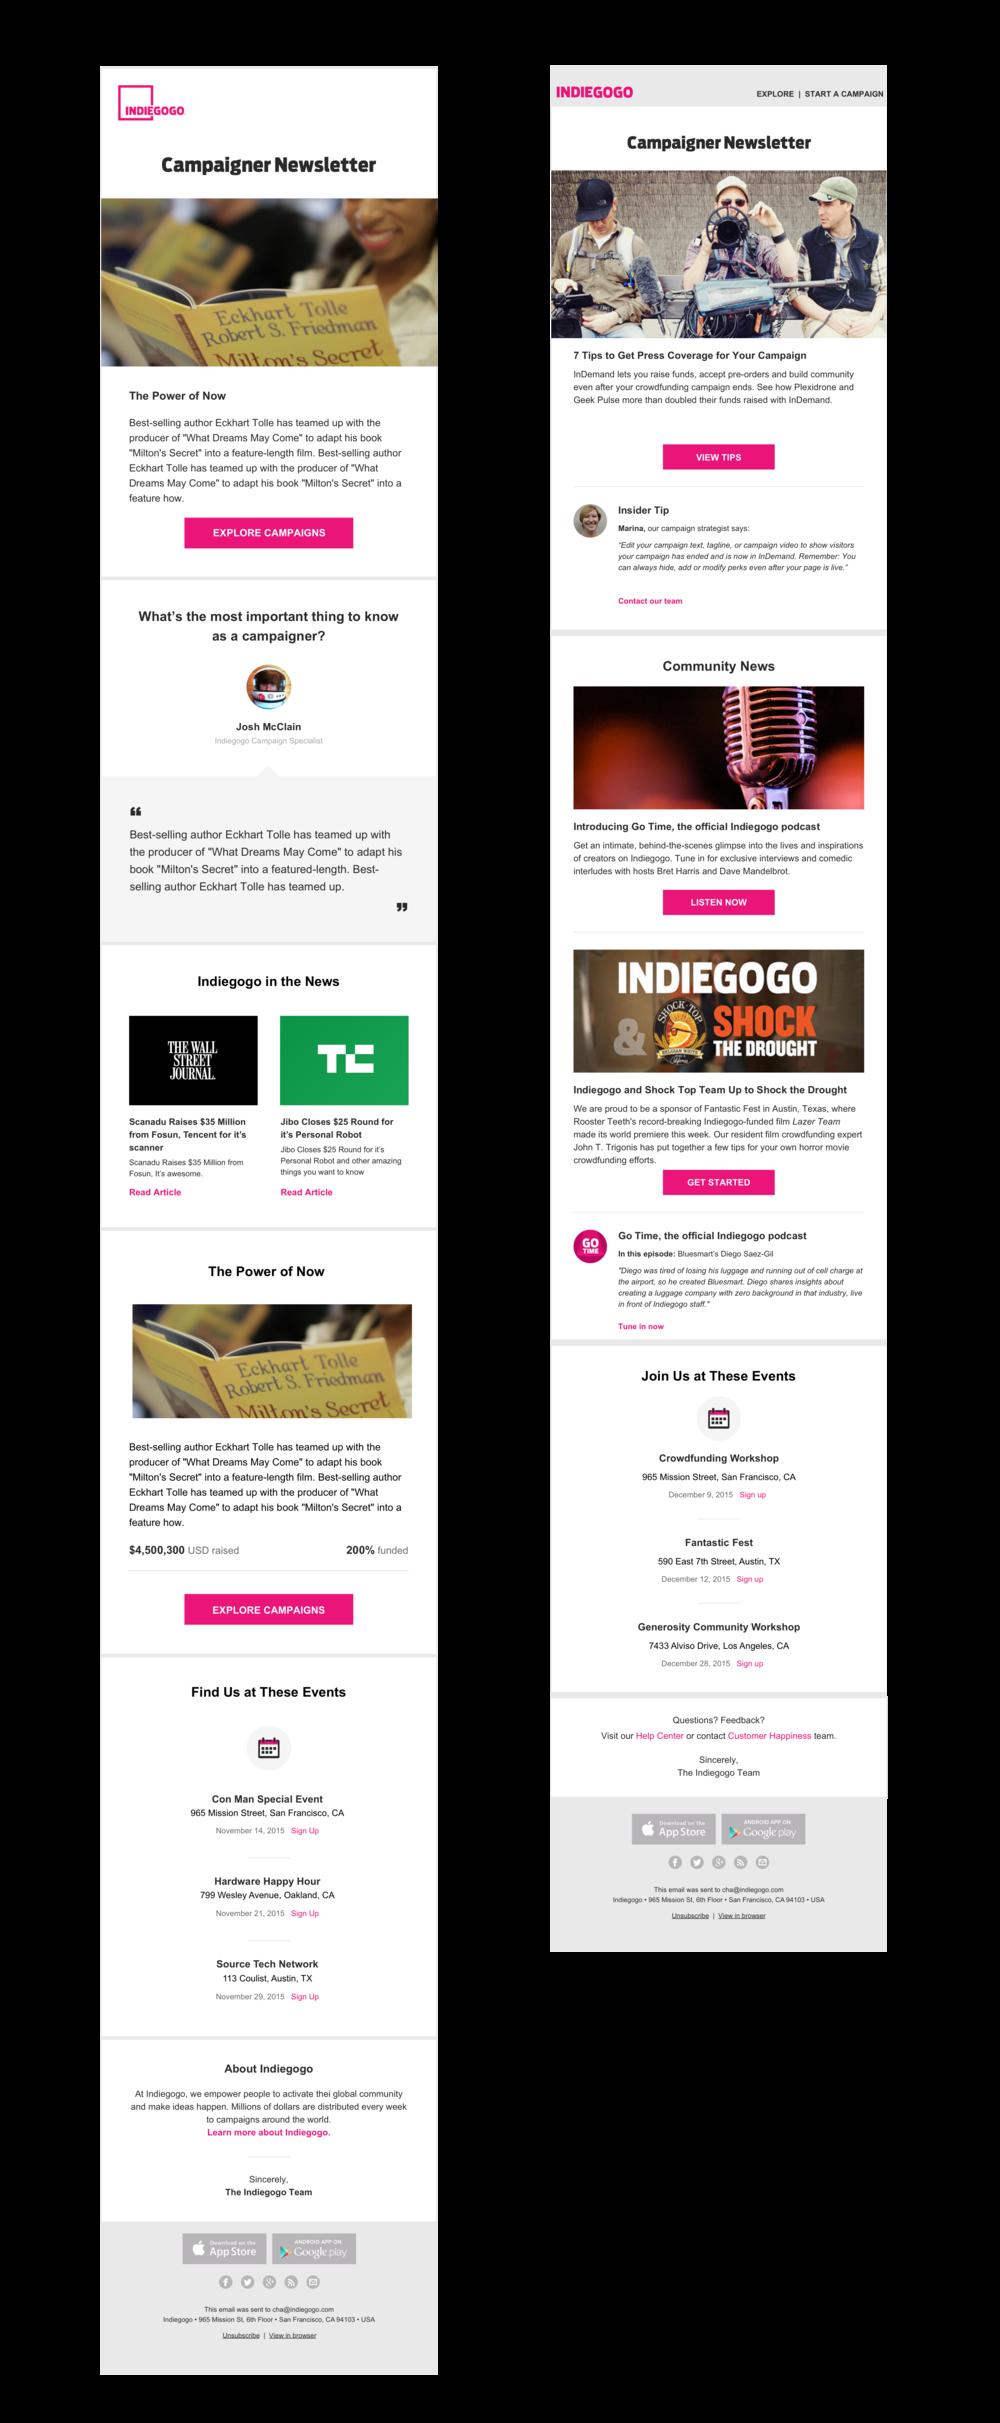 campaigner-newsletter copy 3.png